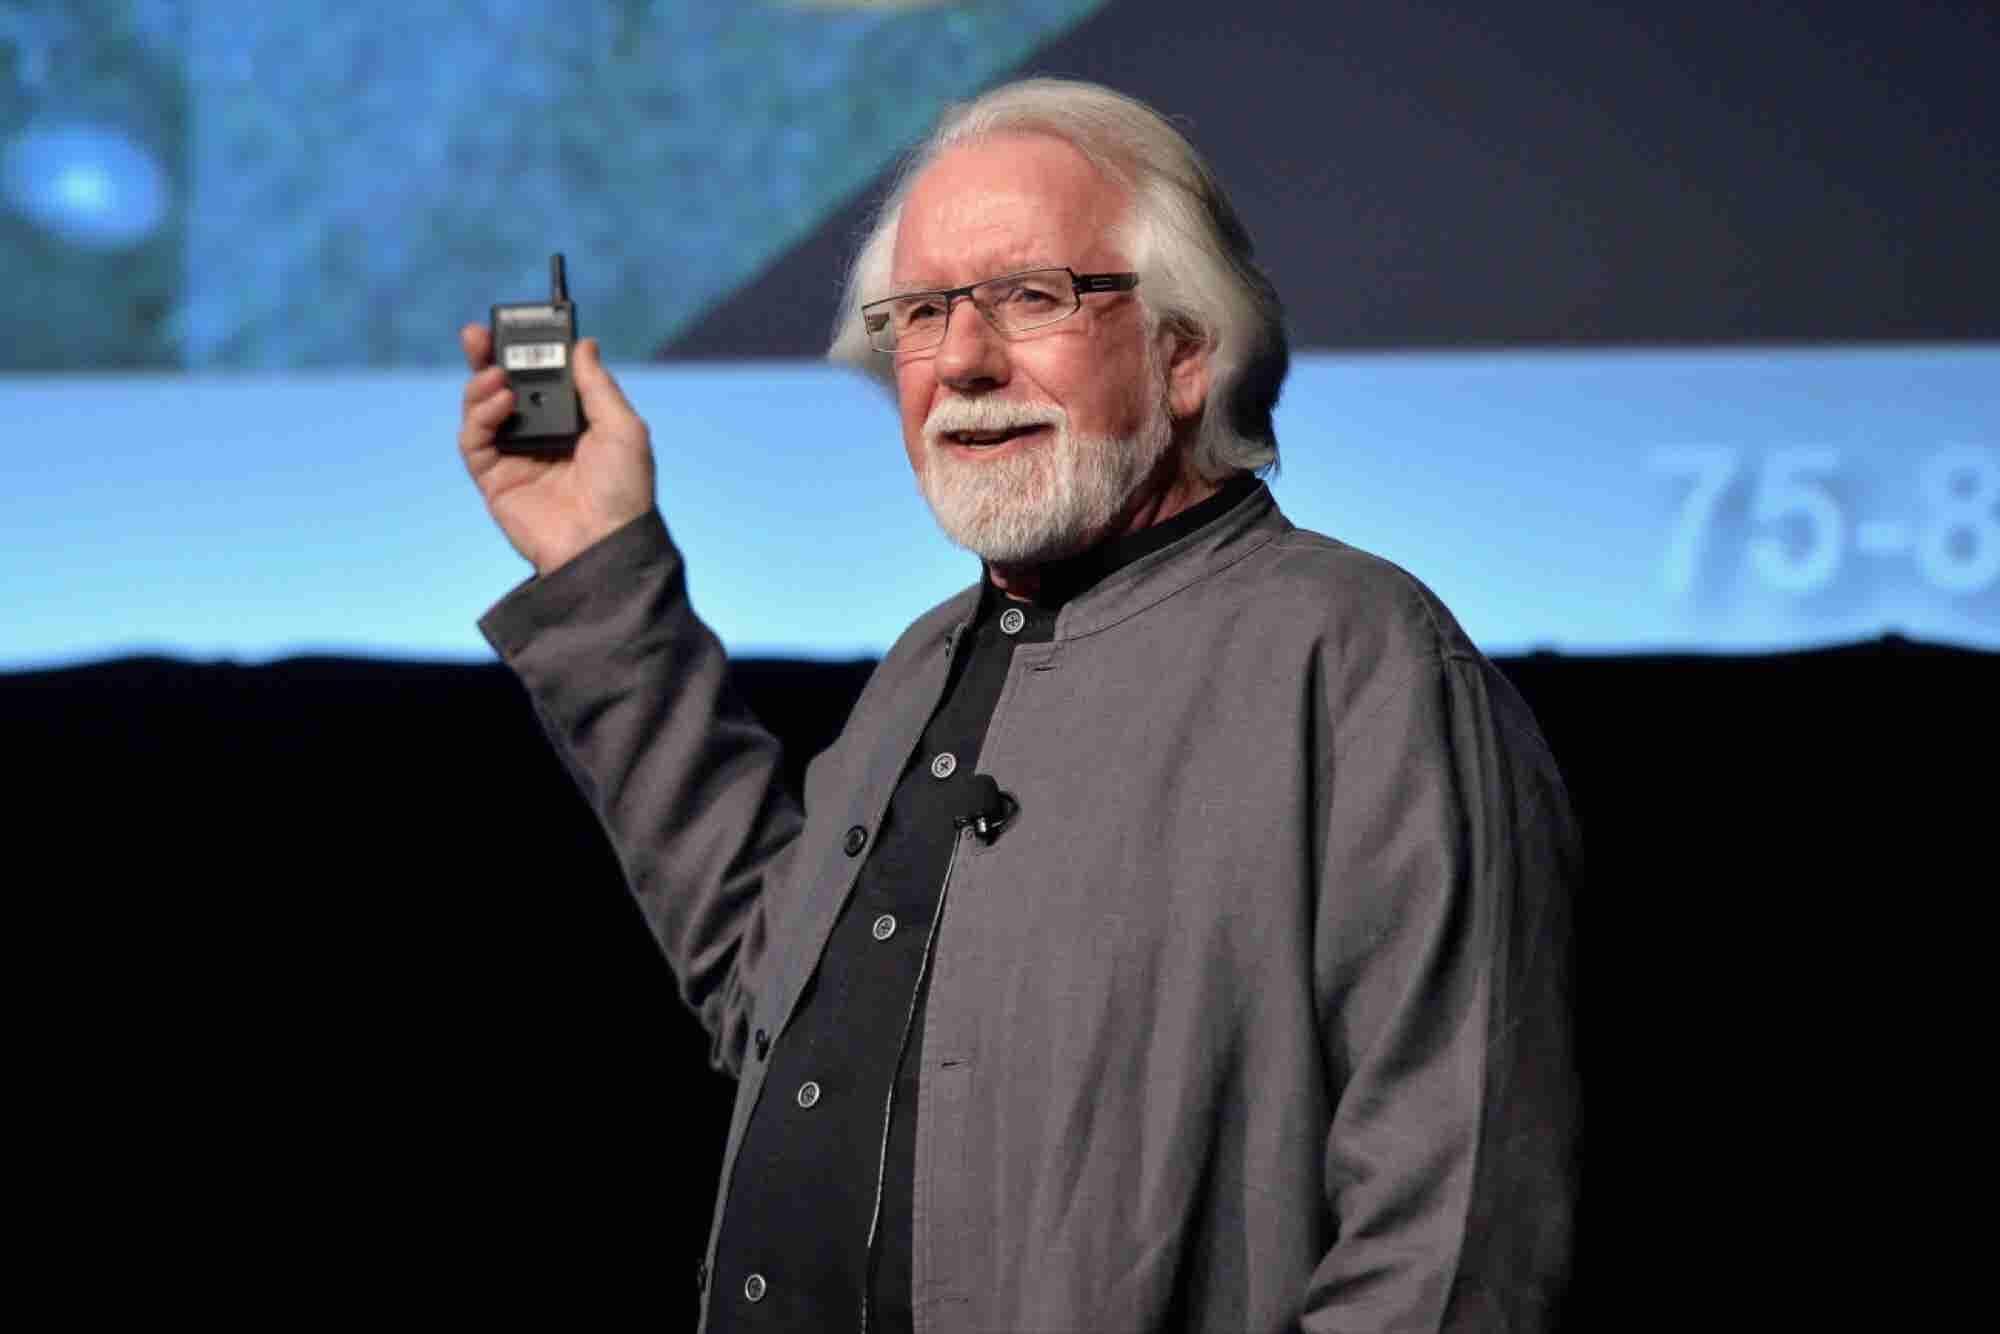 Pixar's Co-Founders Heard 'No' 45 Times Before Steve Jobs Said 'Yes'